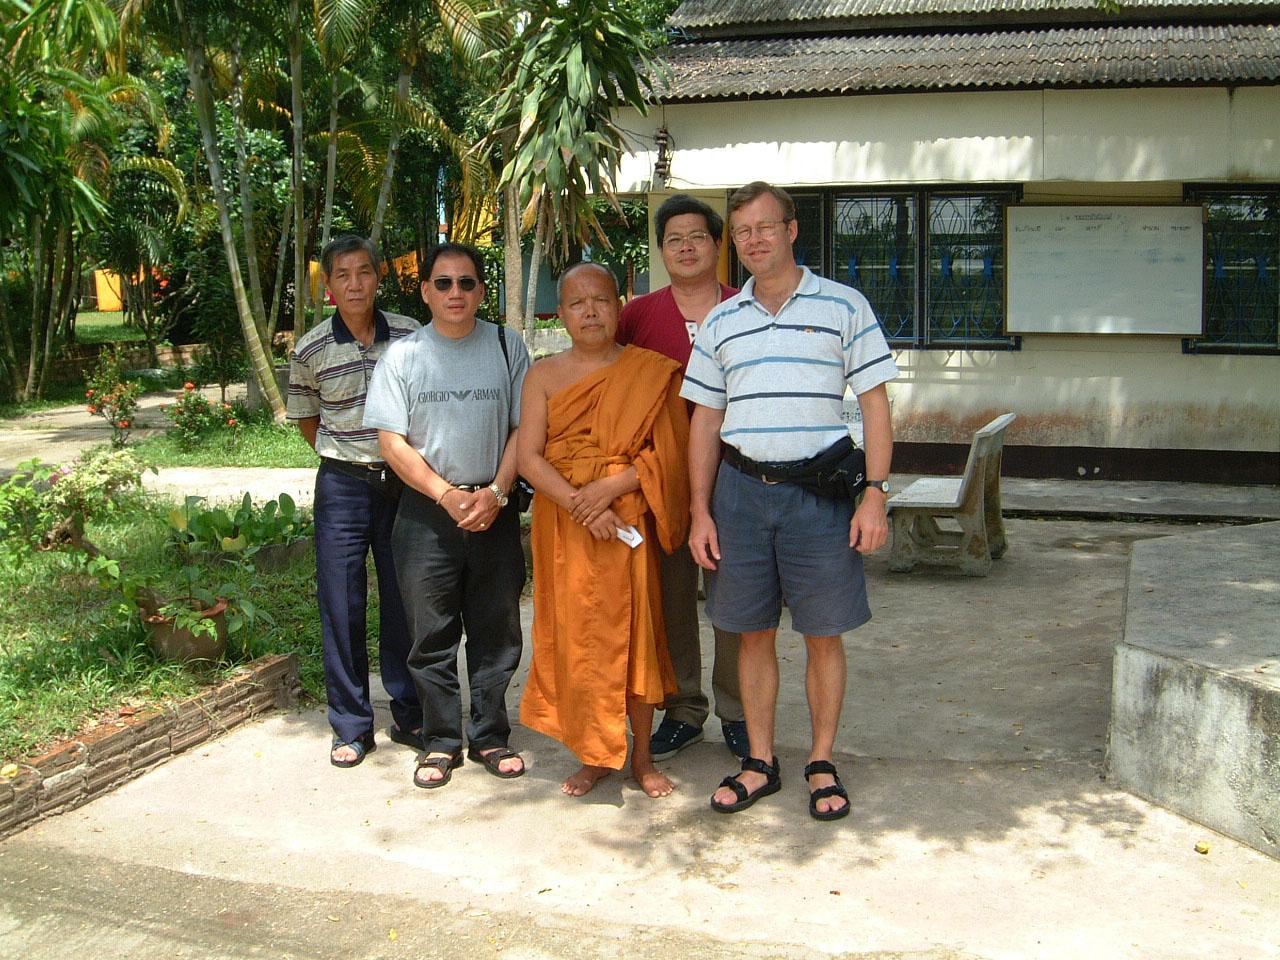 Buddhist Pilgrimage Southern Thailand Apr 2001 01